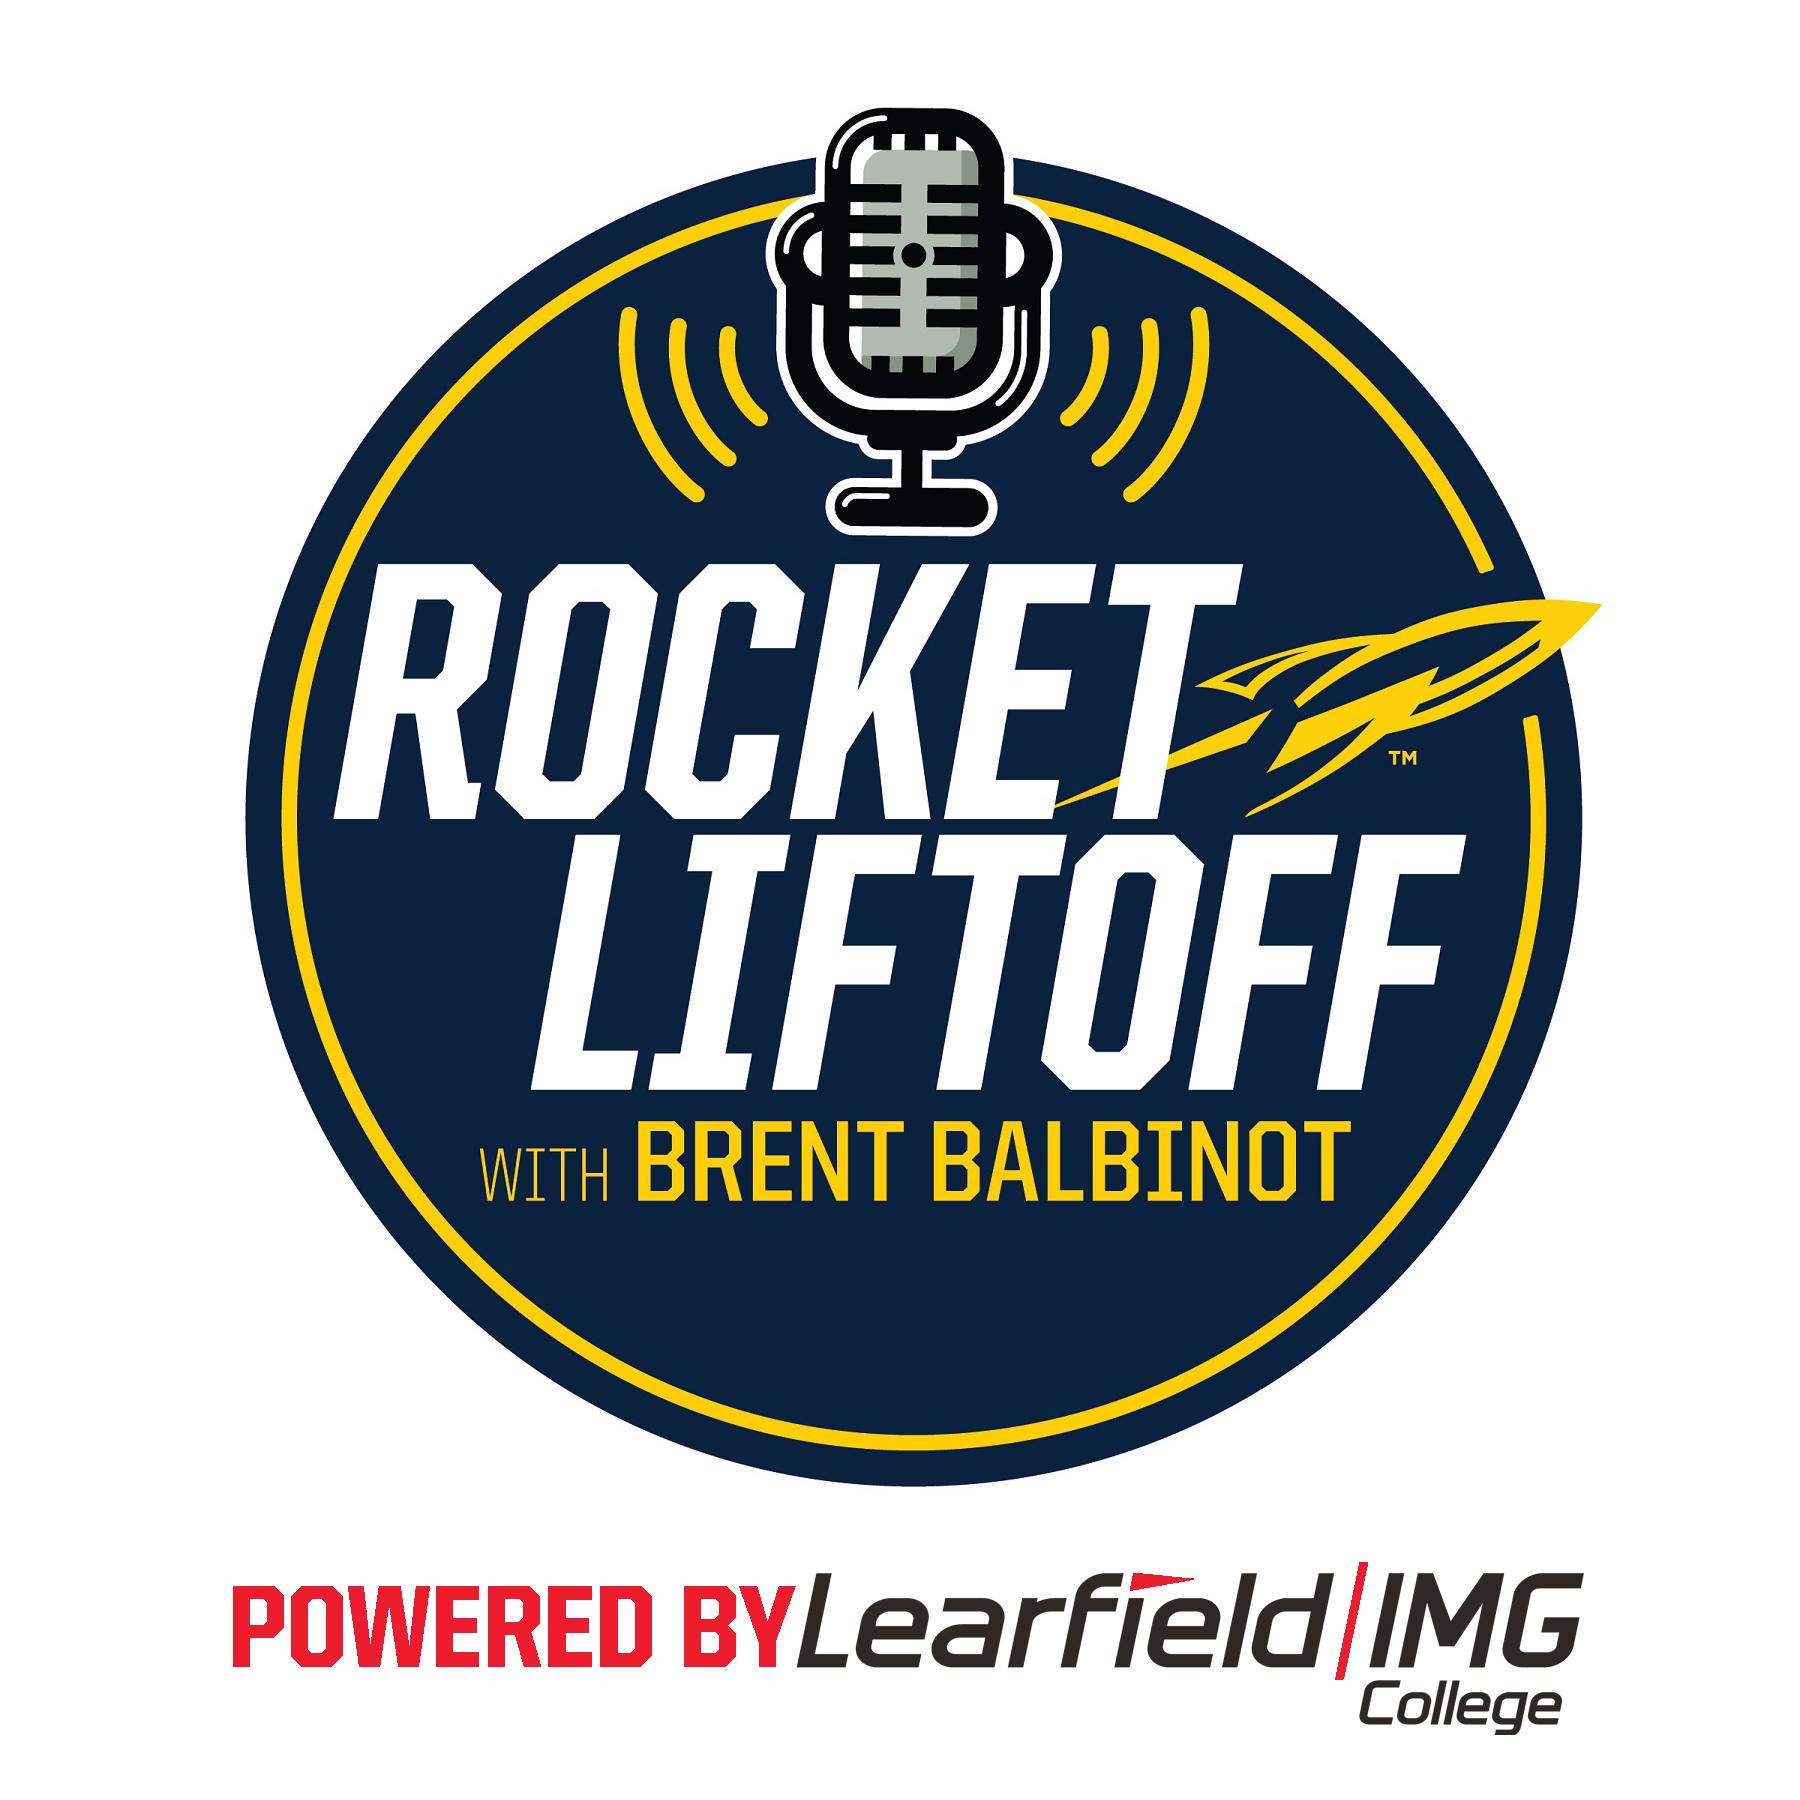 The Rocket Liftoff Podcast